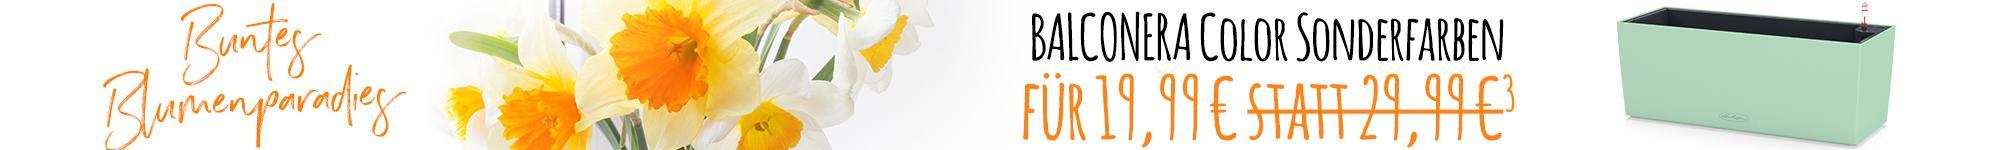 le_listing_banner_balconera_02221_de